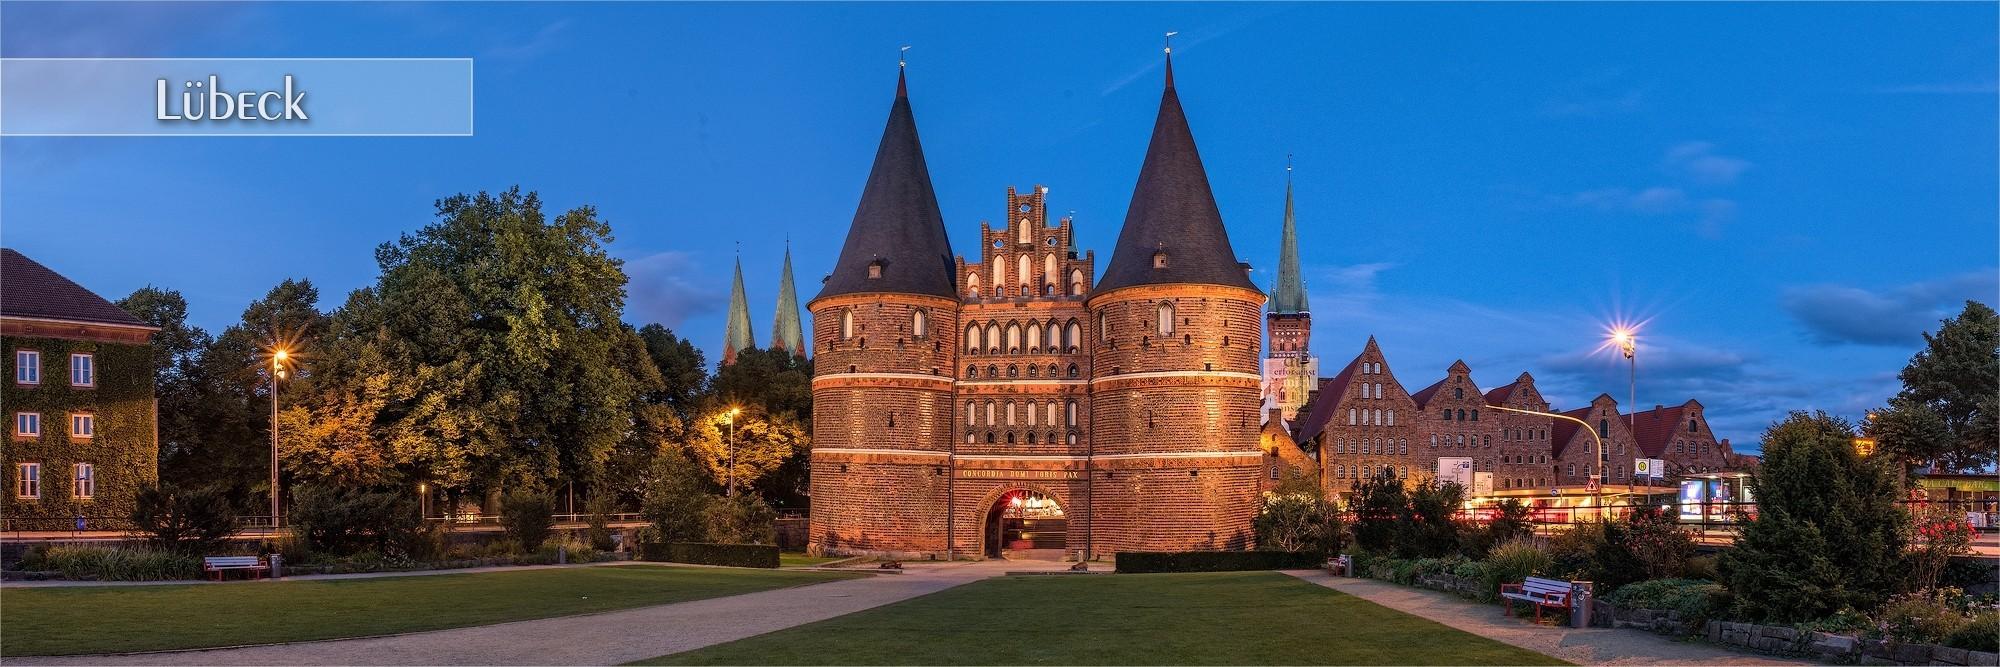 Fineart & Panoramafotografien aus Lübeck